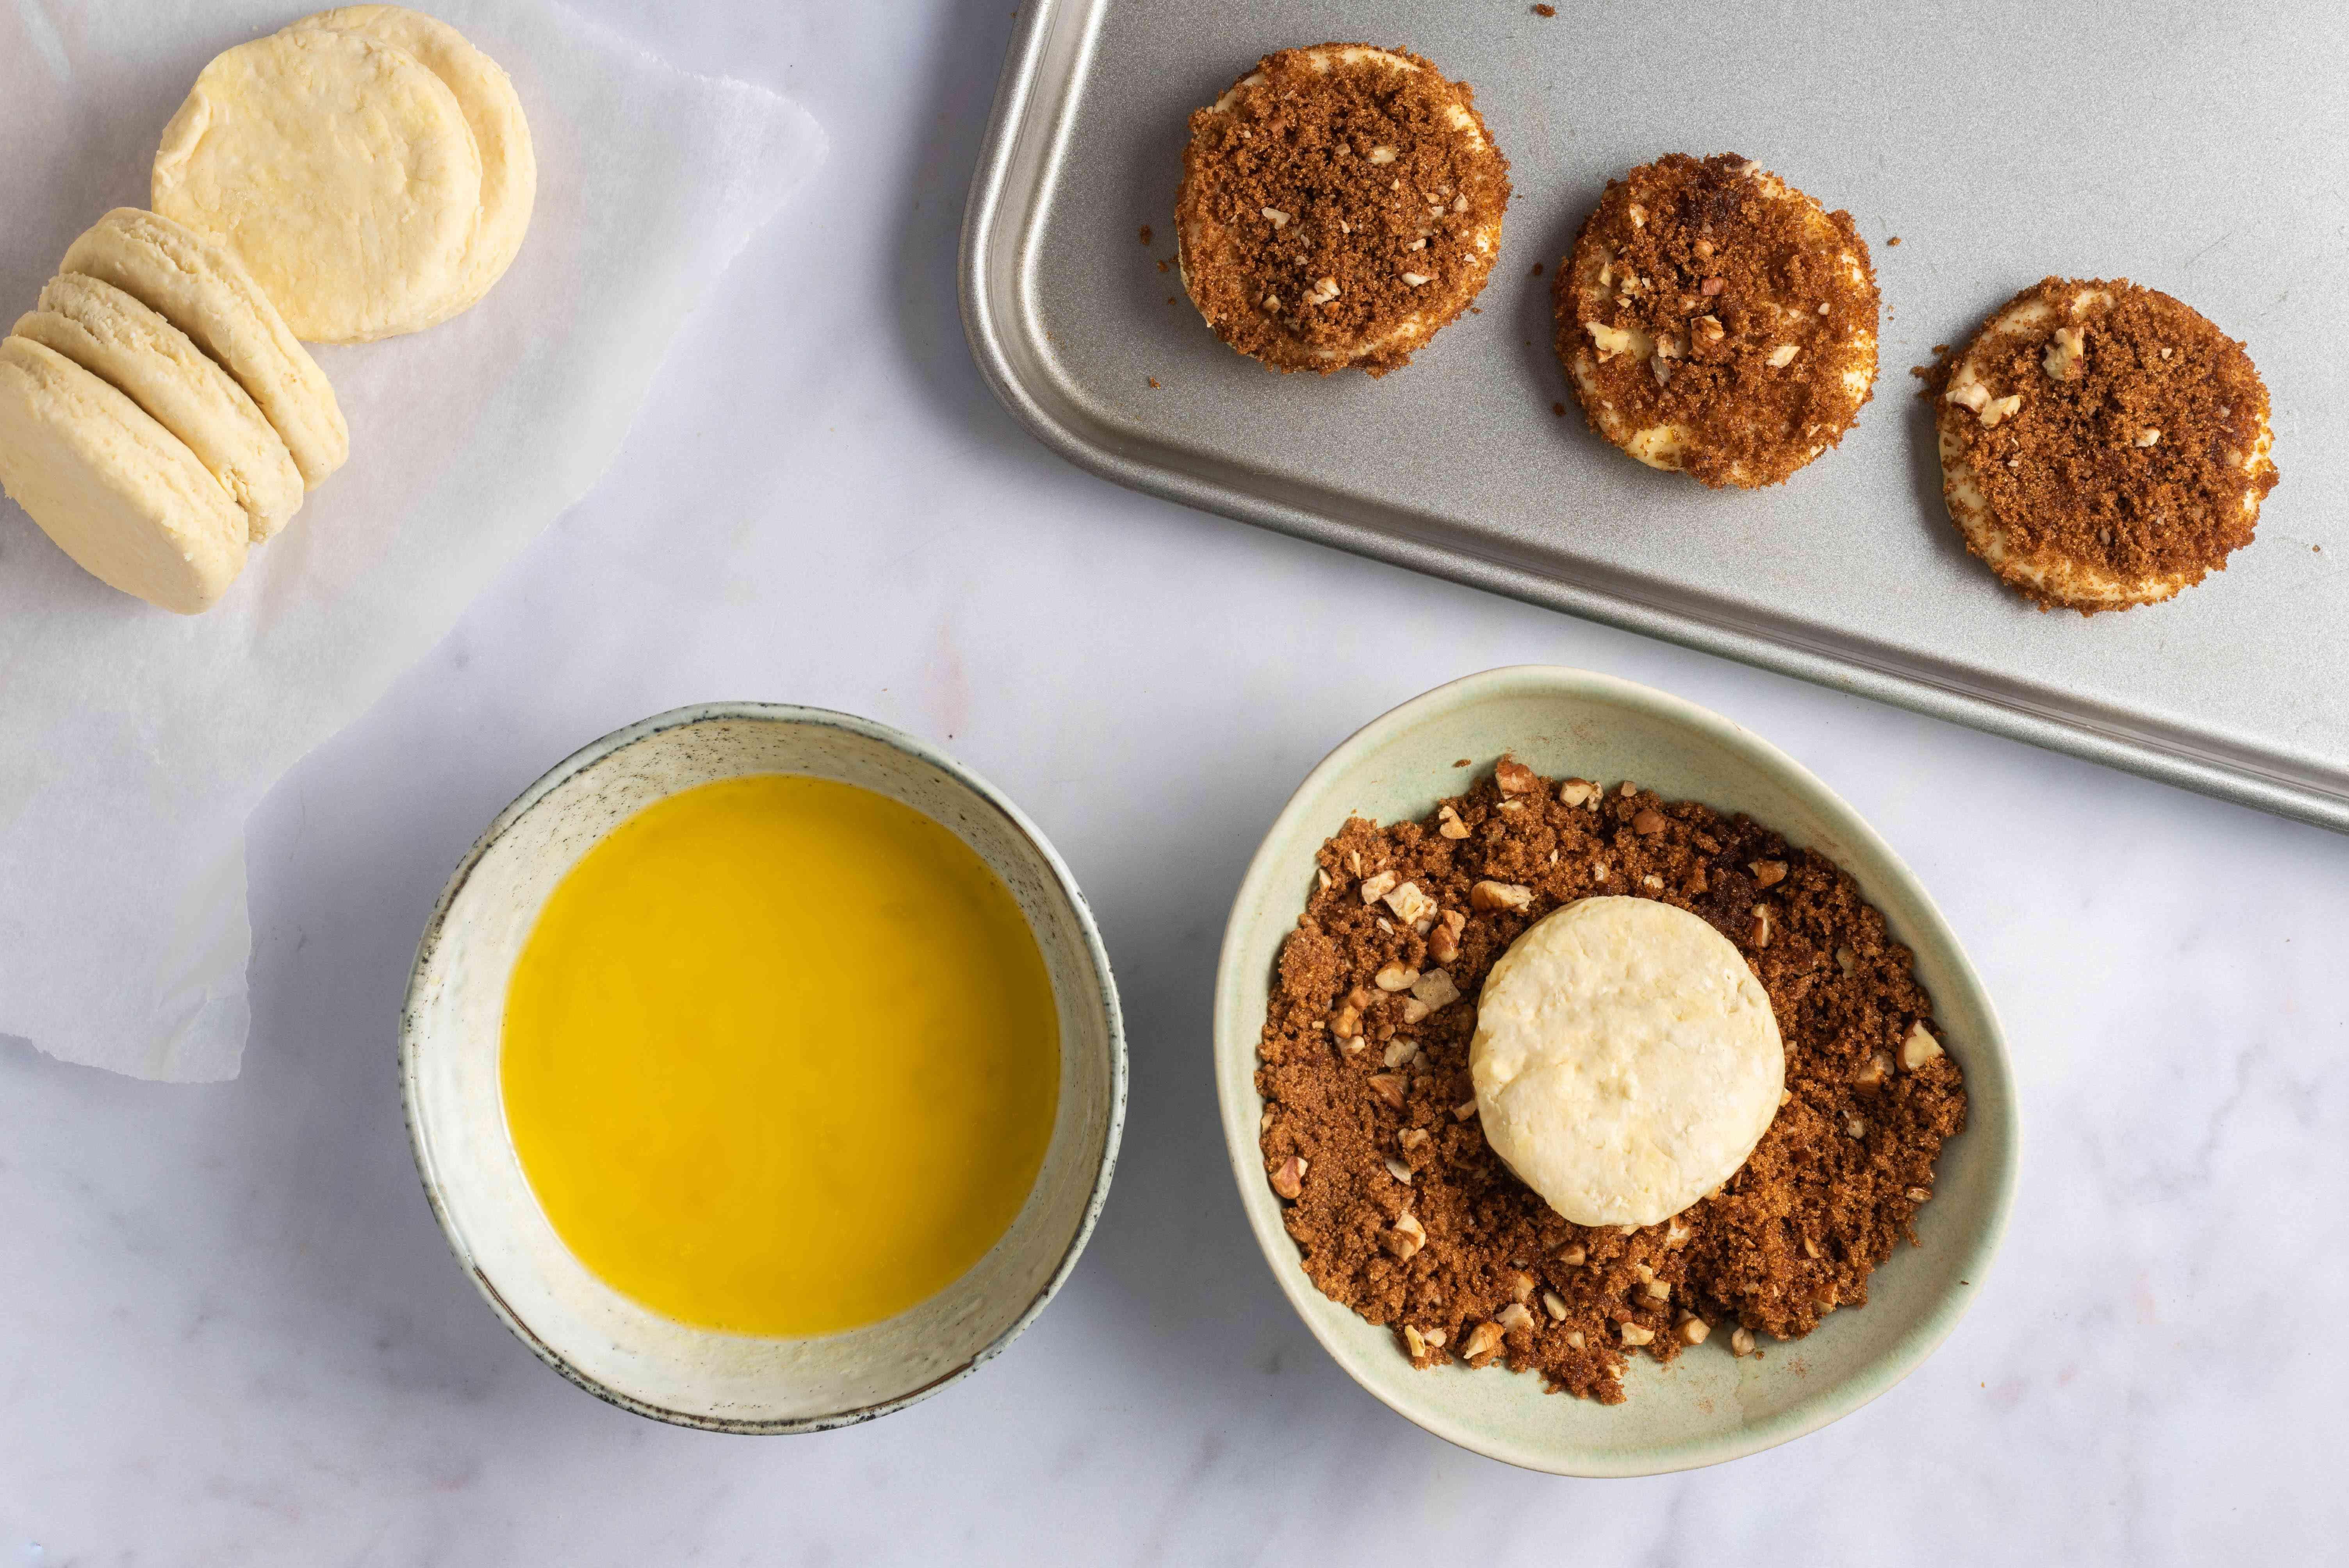 Dip cookie in dough